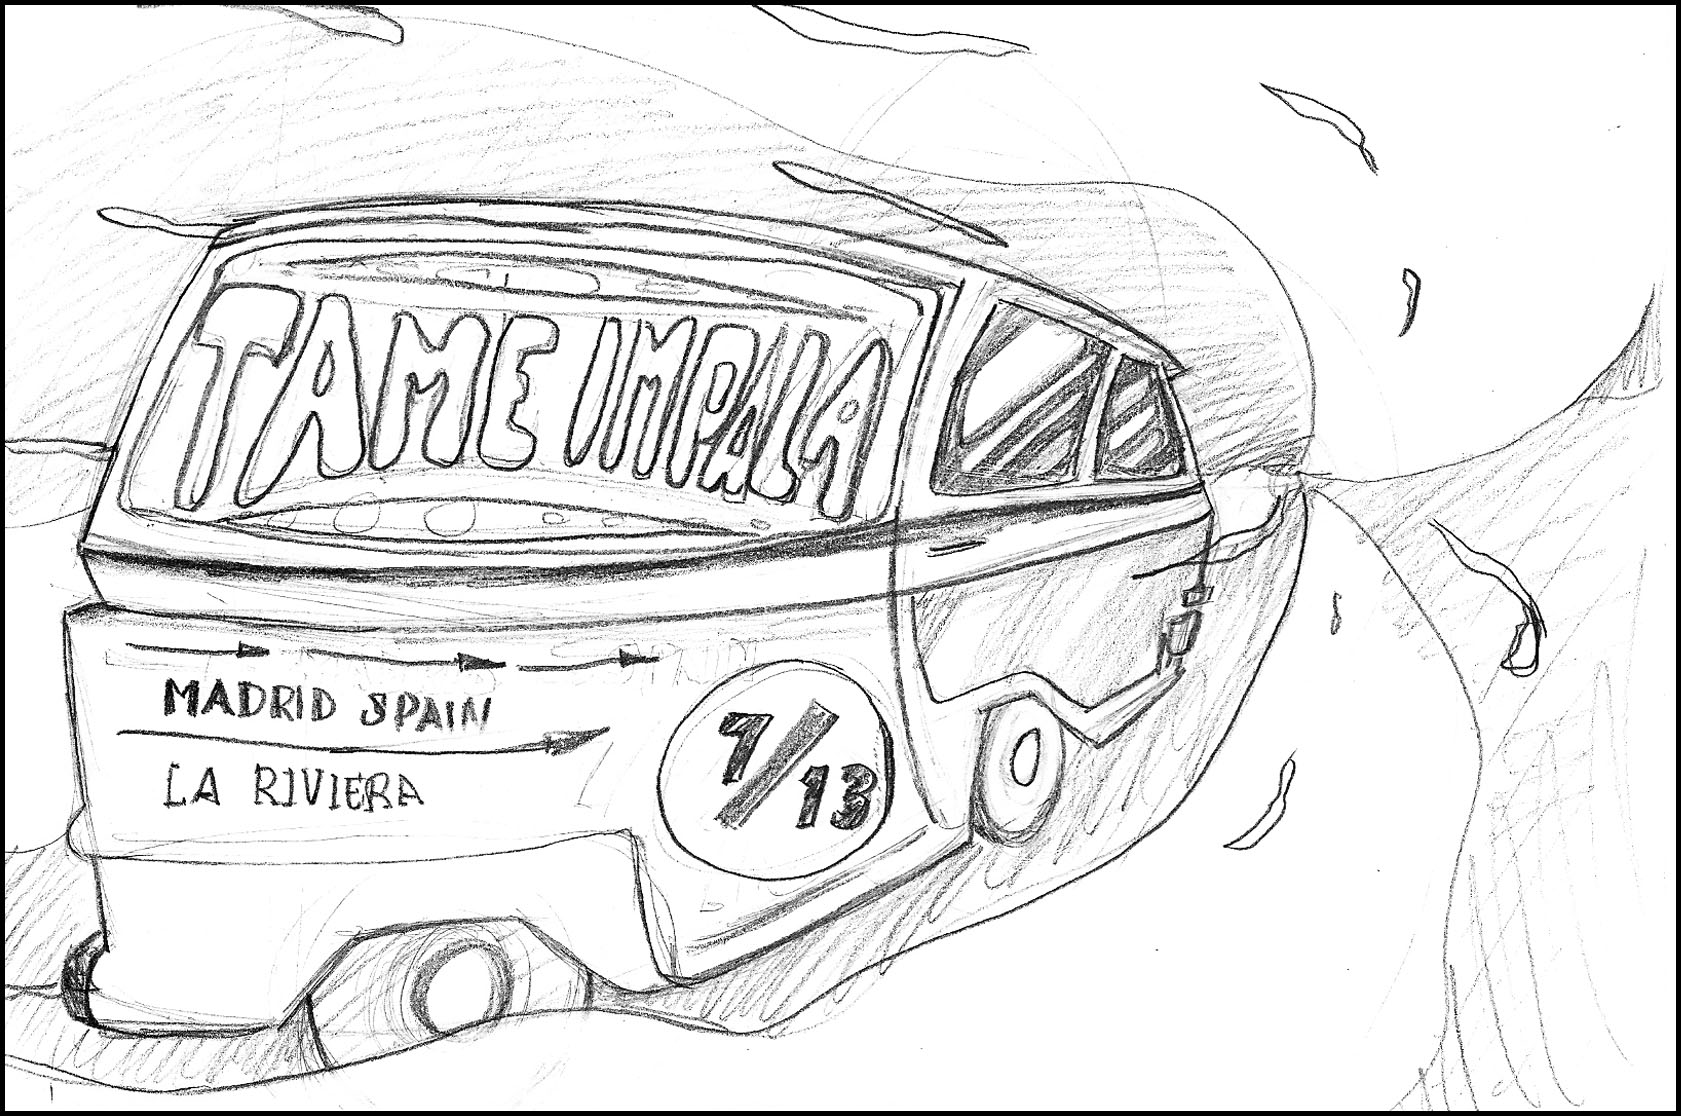 Tame Impala · Madrid, Spain - image 9 - student project